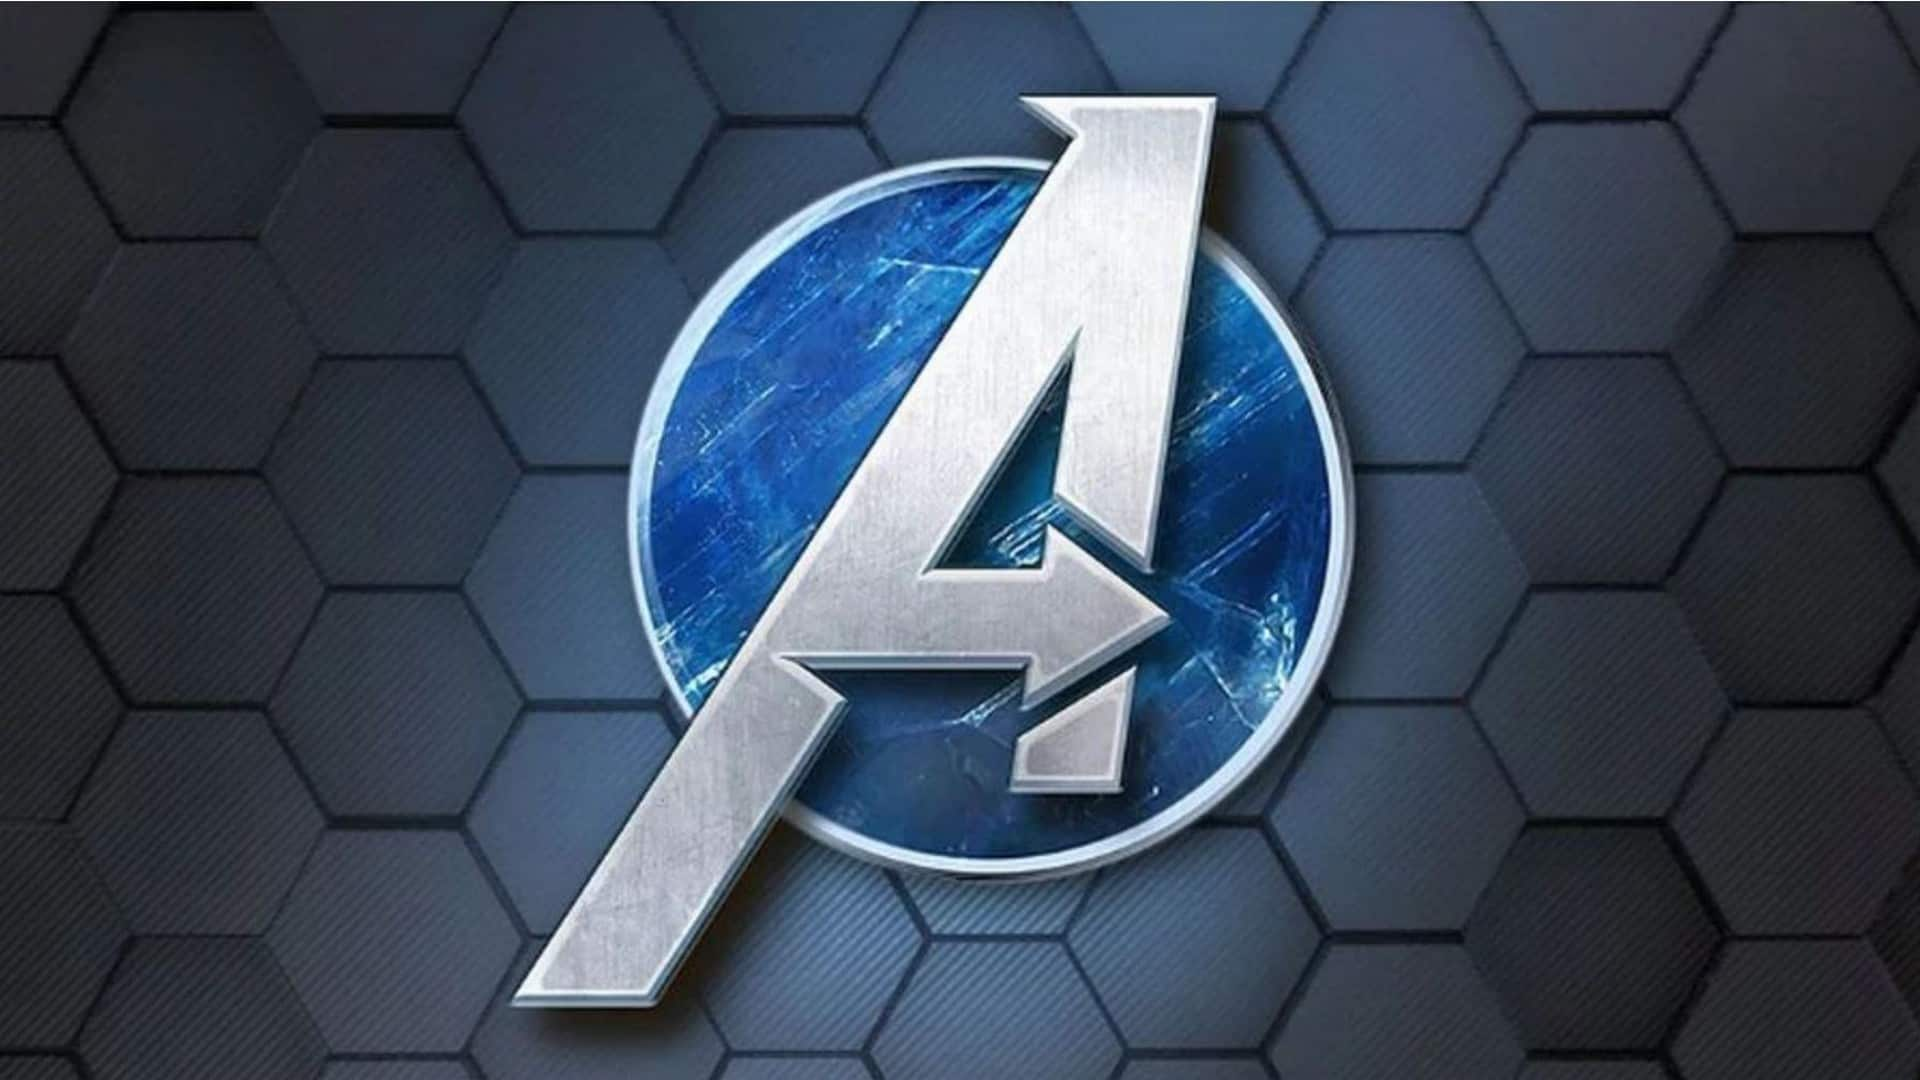 Square Enix And Marvel Entertainment Reveal Marvel's Avengers